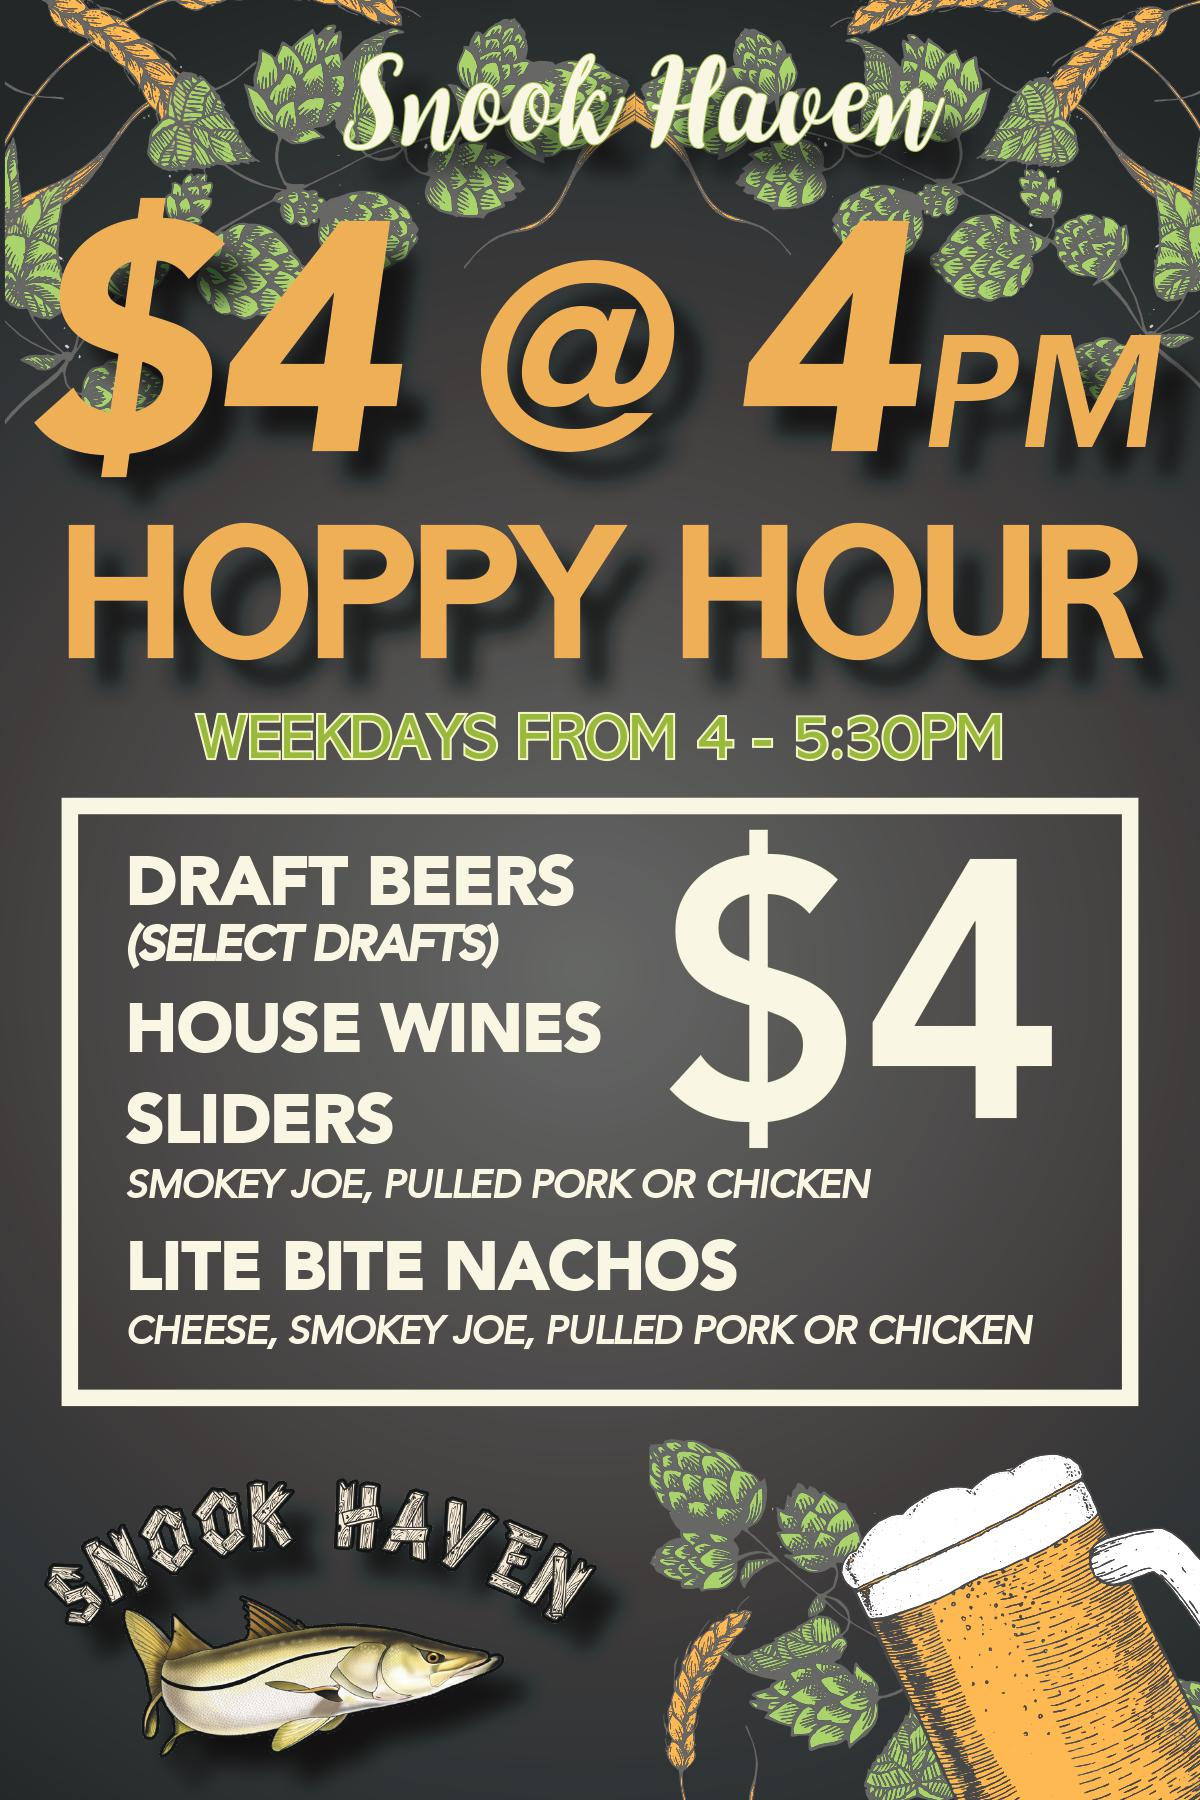 Hoppy Hour Begins on Wednesday, August 18th!